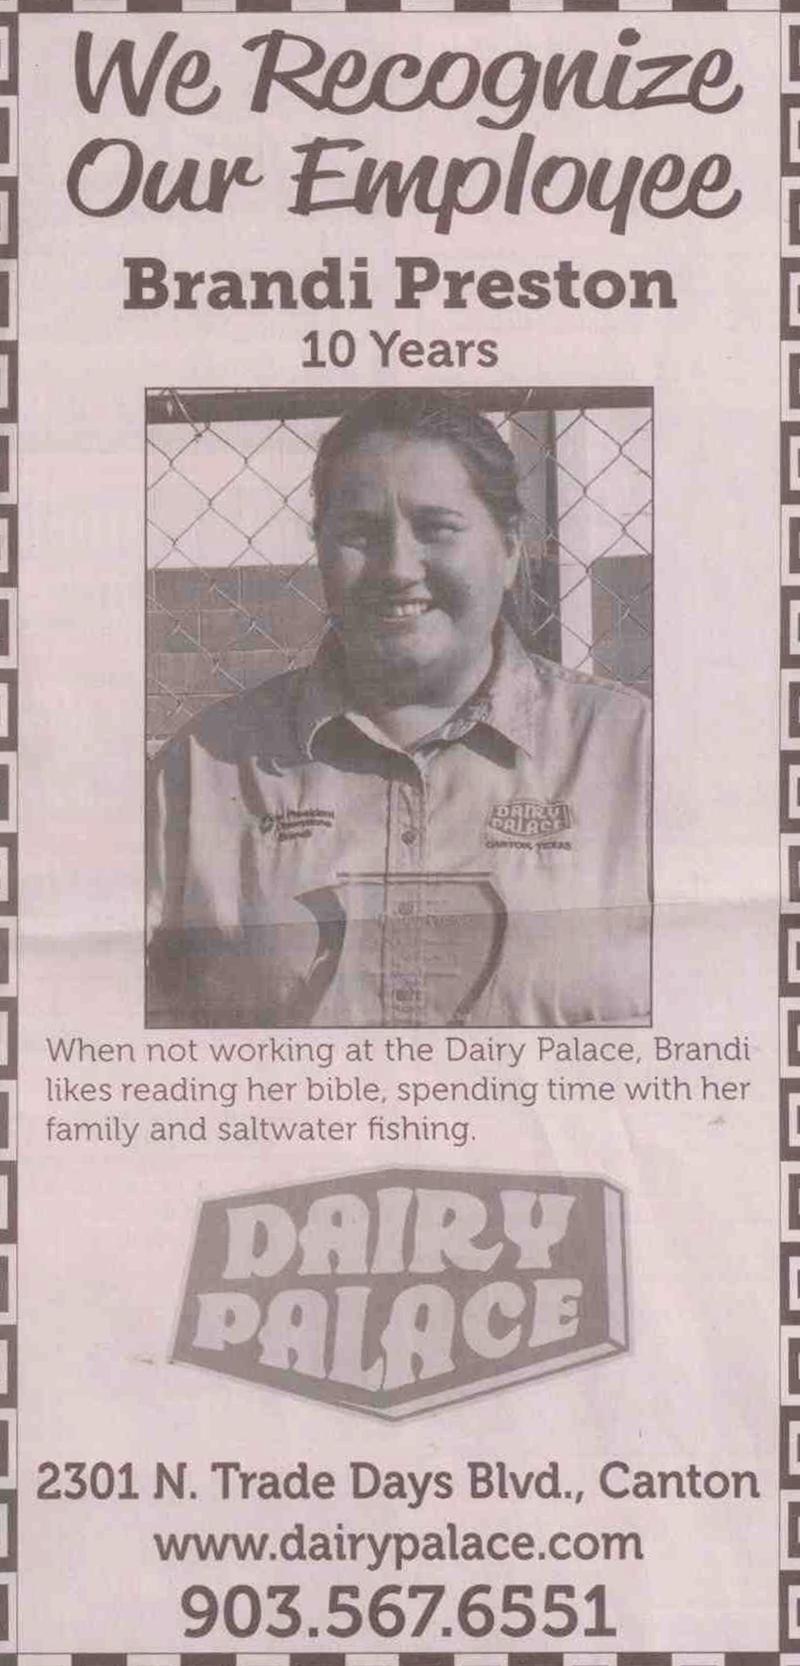 Brandi-Preston-Canton-TX-Diary-Palace-10-years